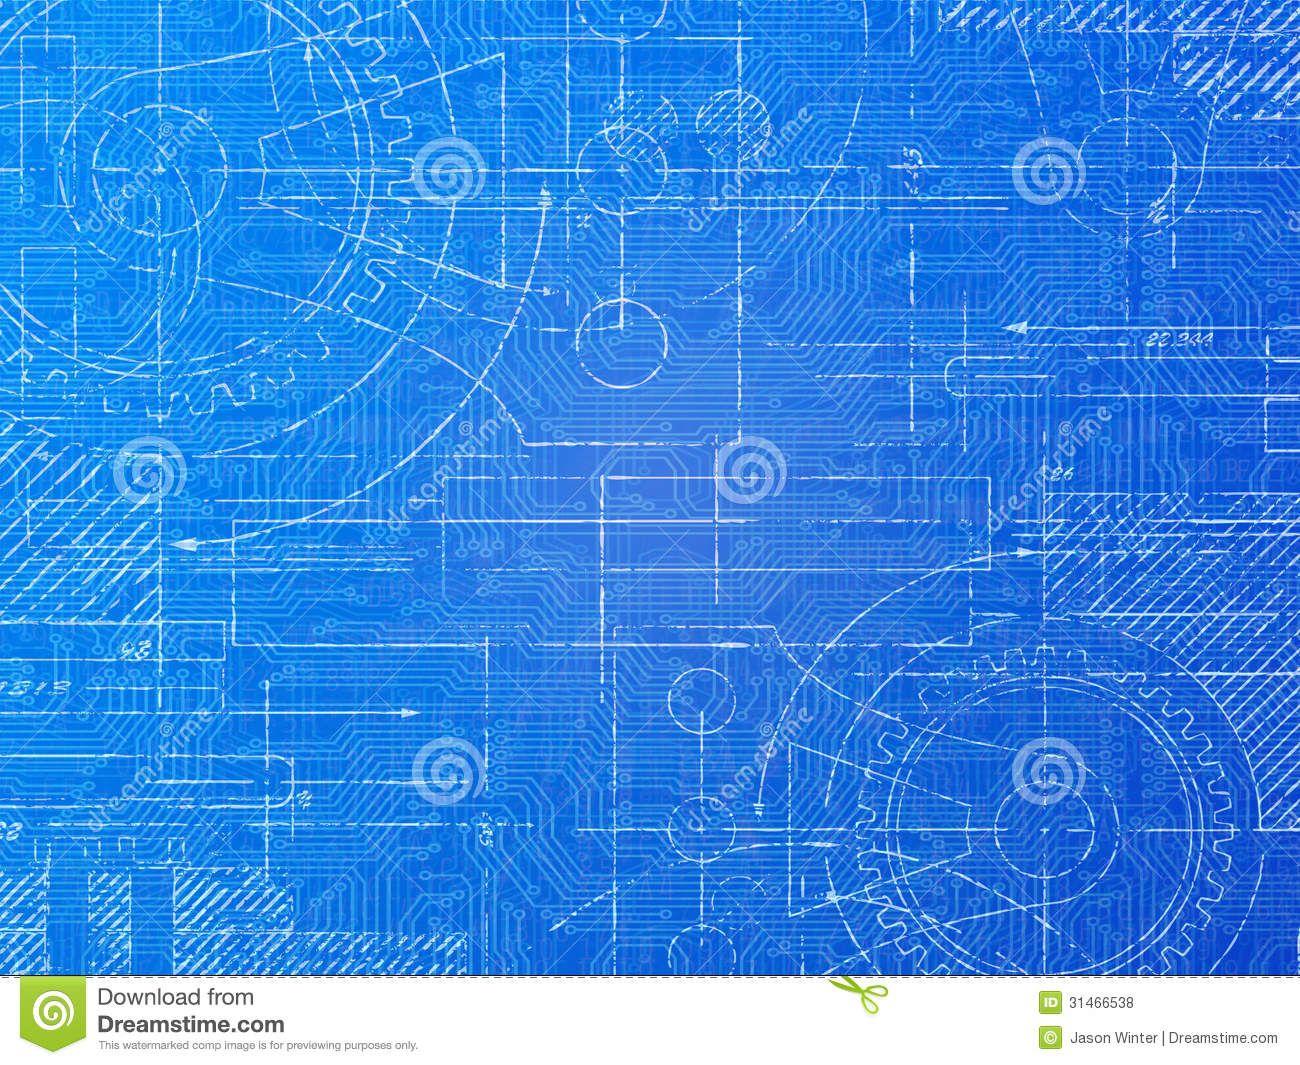 19421238 technical blueprint electronics and mechanical background 19421238 technical blueprint electronics and mechanical background illustration stock illustrationg 1300974 inkspiration pinterest illustrations malvernweather Images